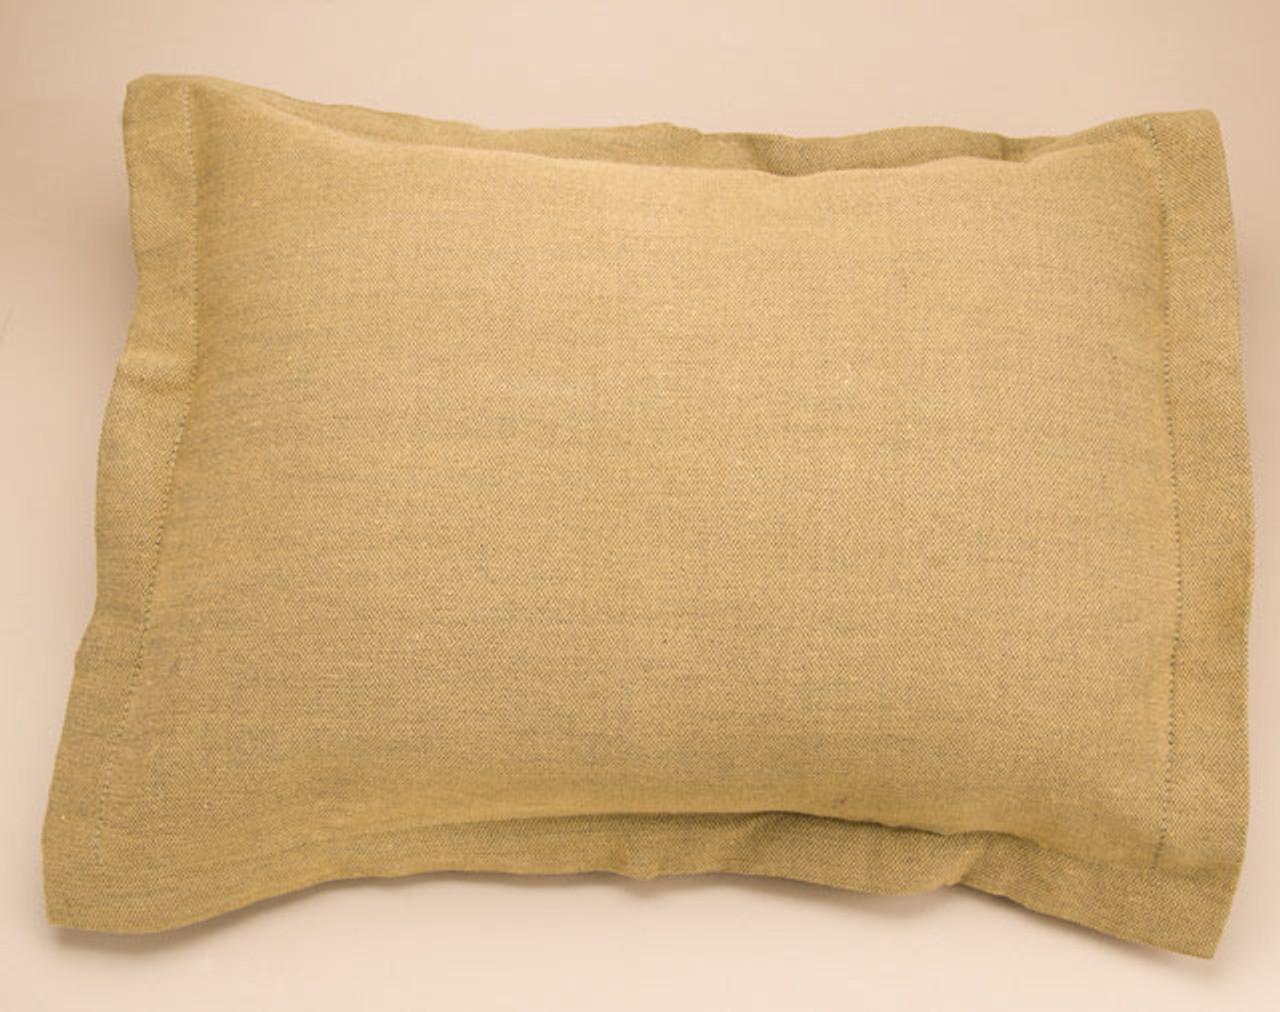 Matching Pillow Sham Camel Or Tan